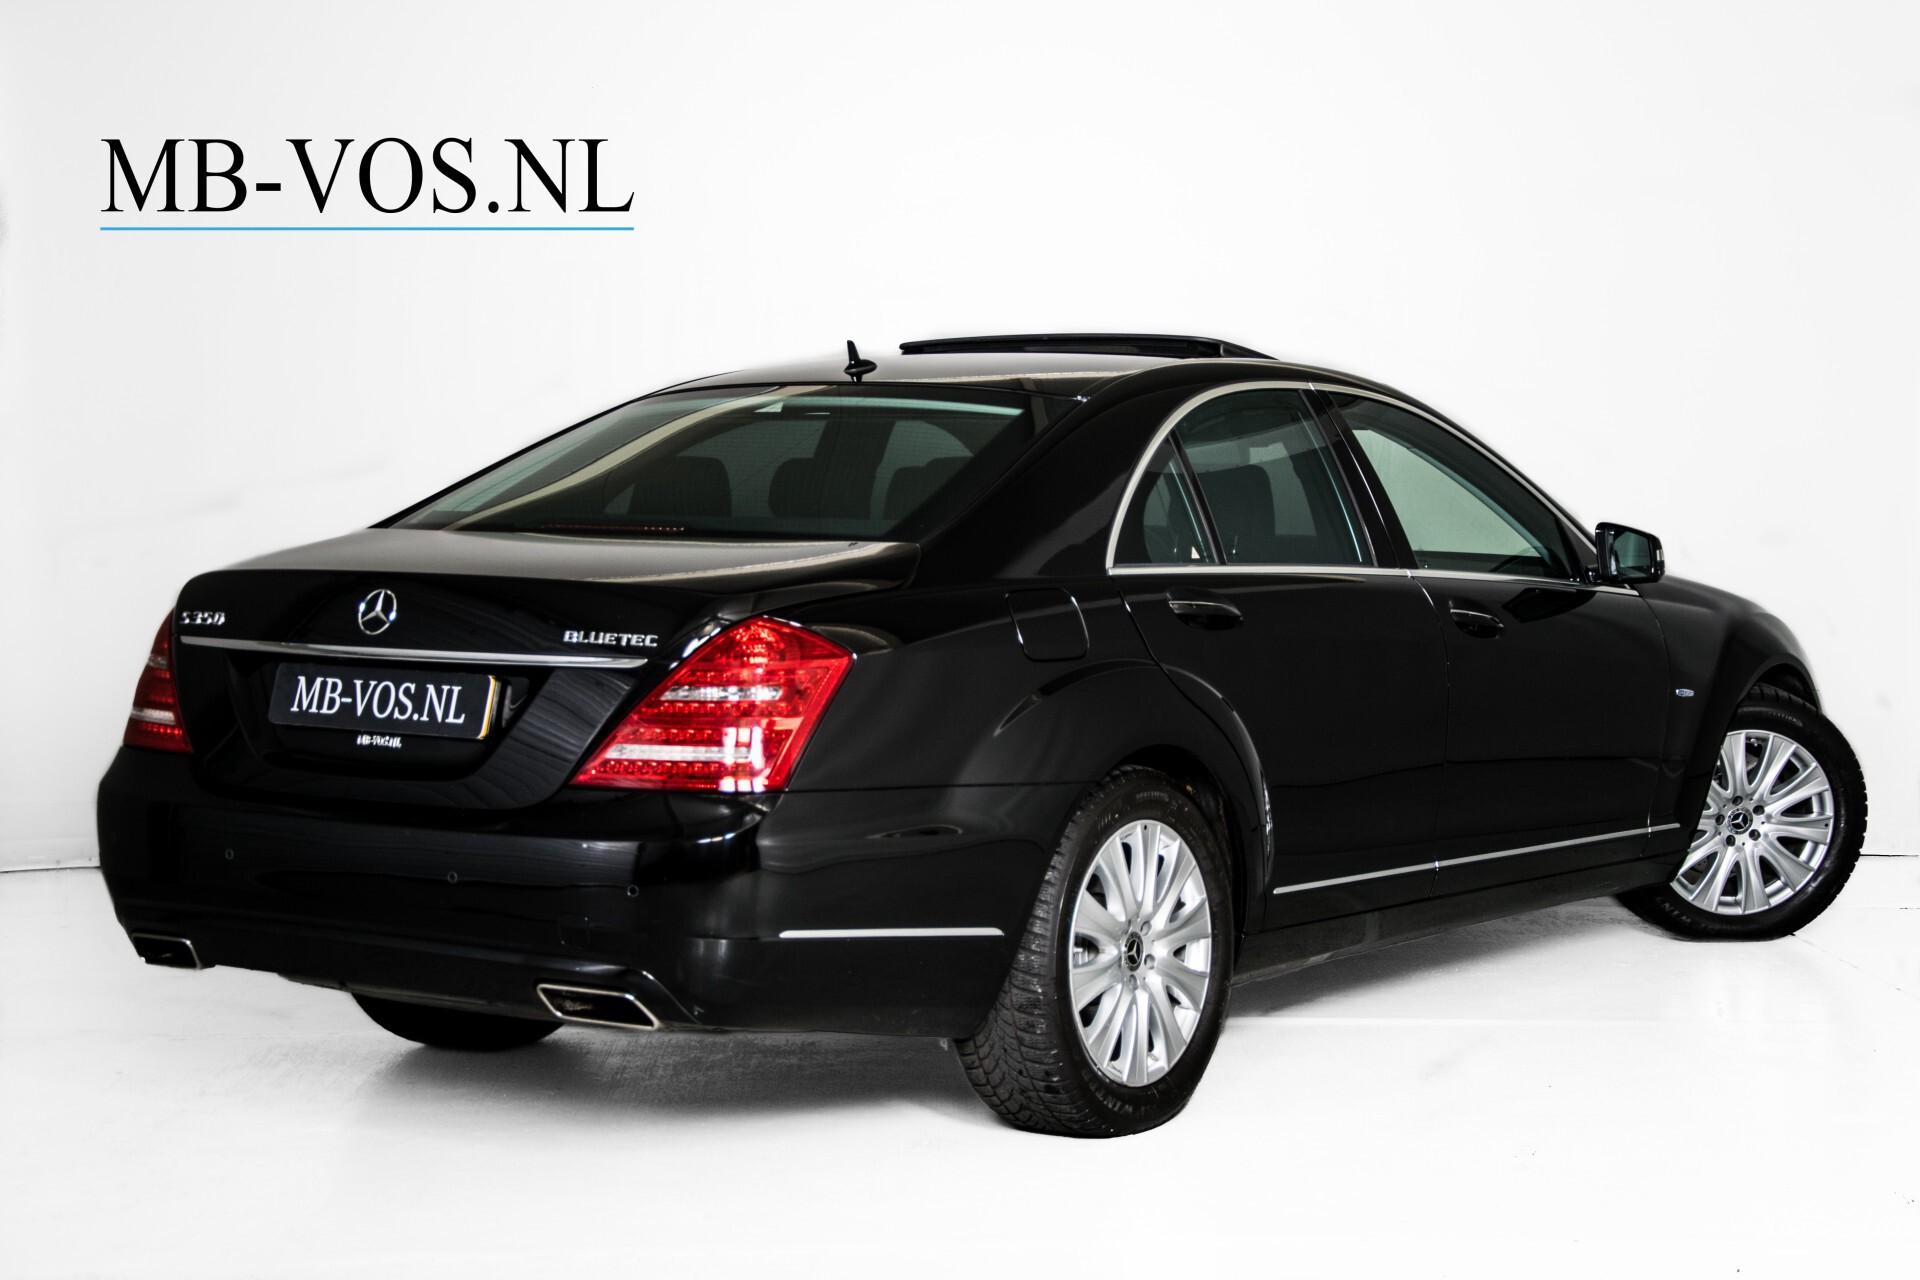 Mercedes-Benz S-Klasse 350 Bluetec Keyless/Distronic/Nightvision/Schuifdak/Harman-Kardon Aut7 Foto 2